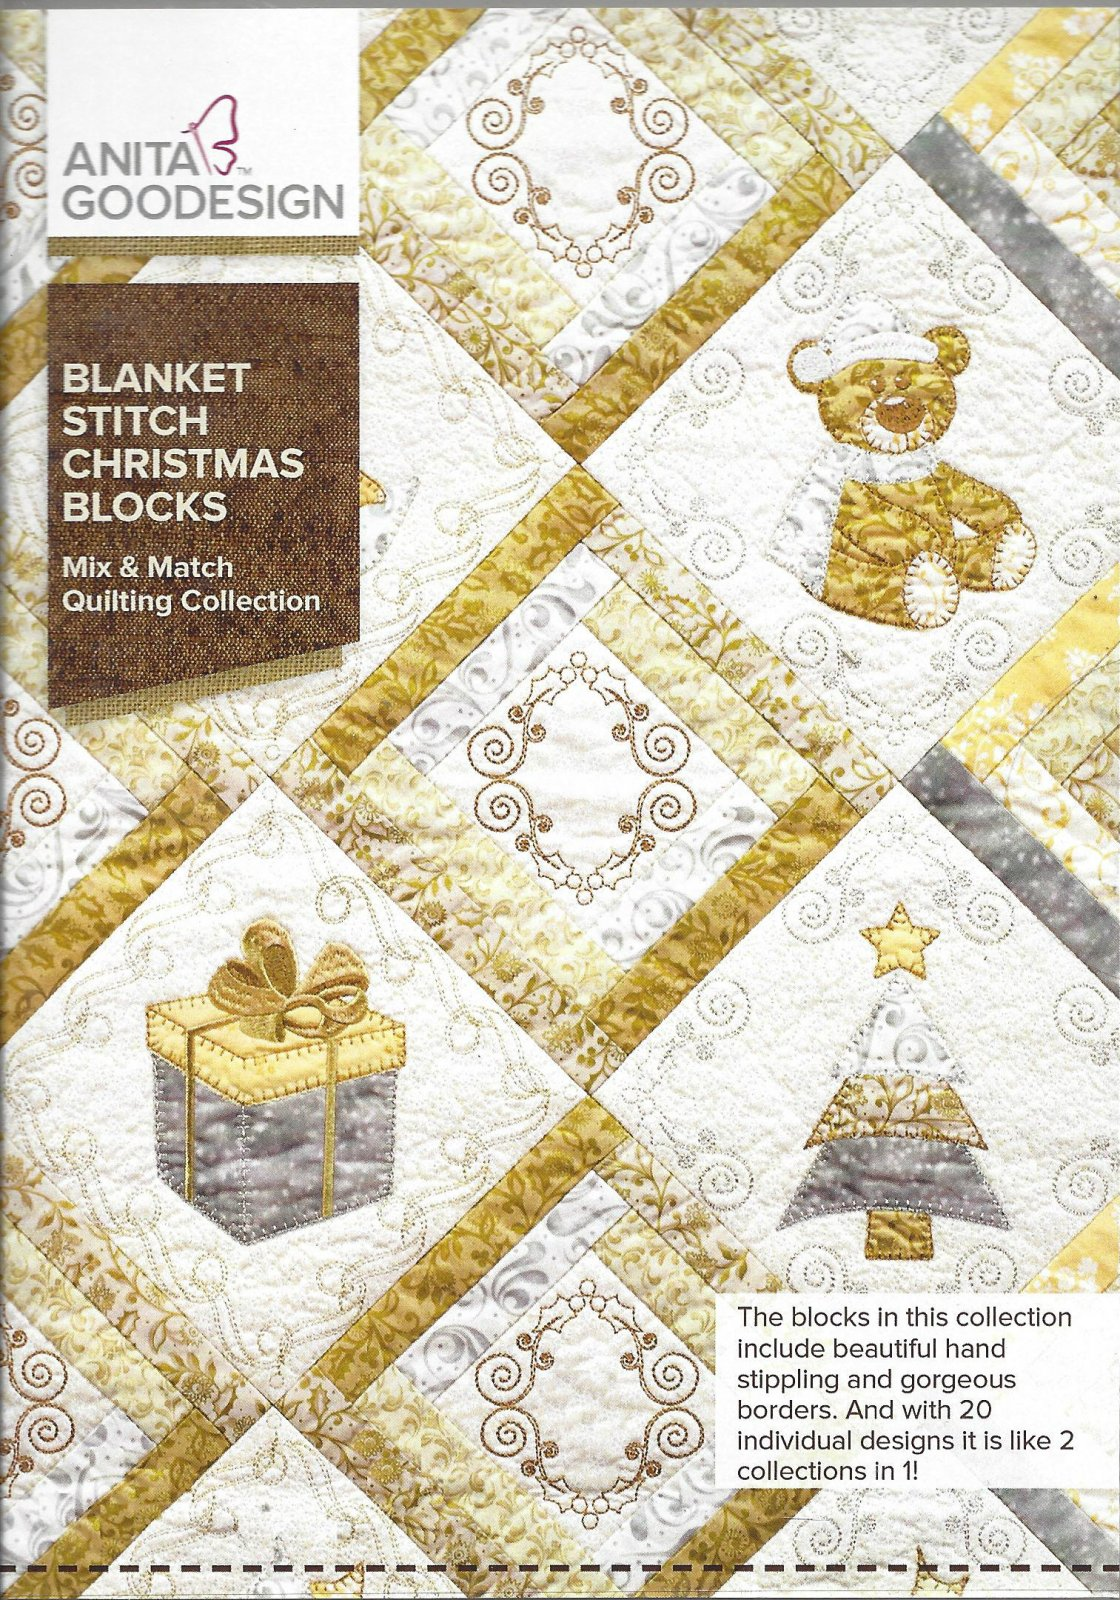 AG BLANKET STITCH CHRISTMAS BLOCKS 174AGHD